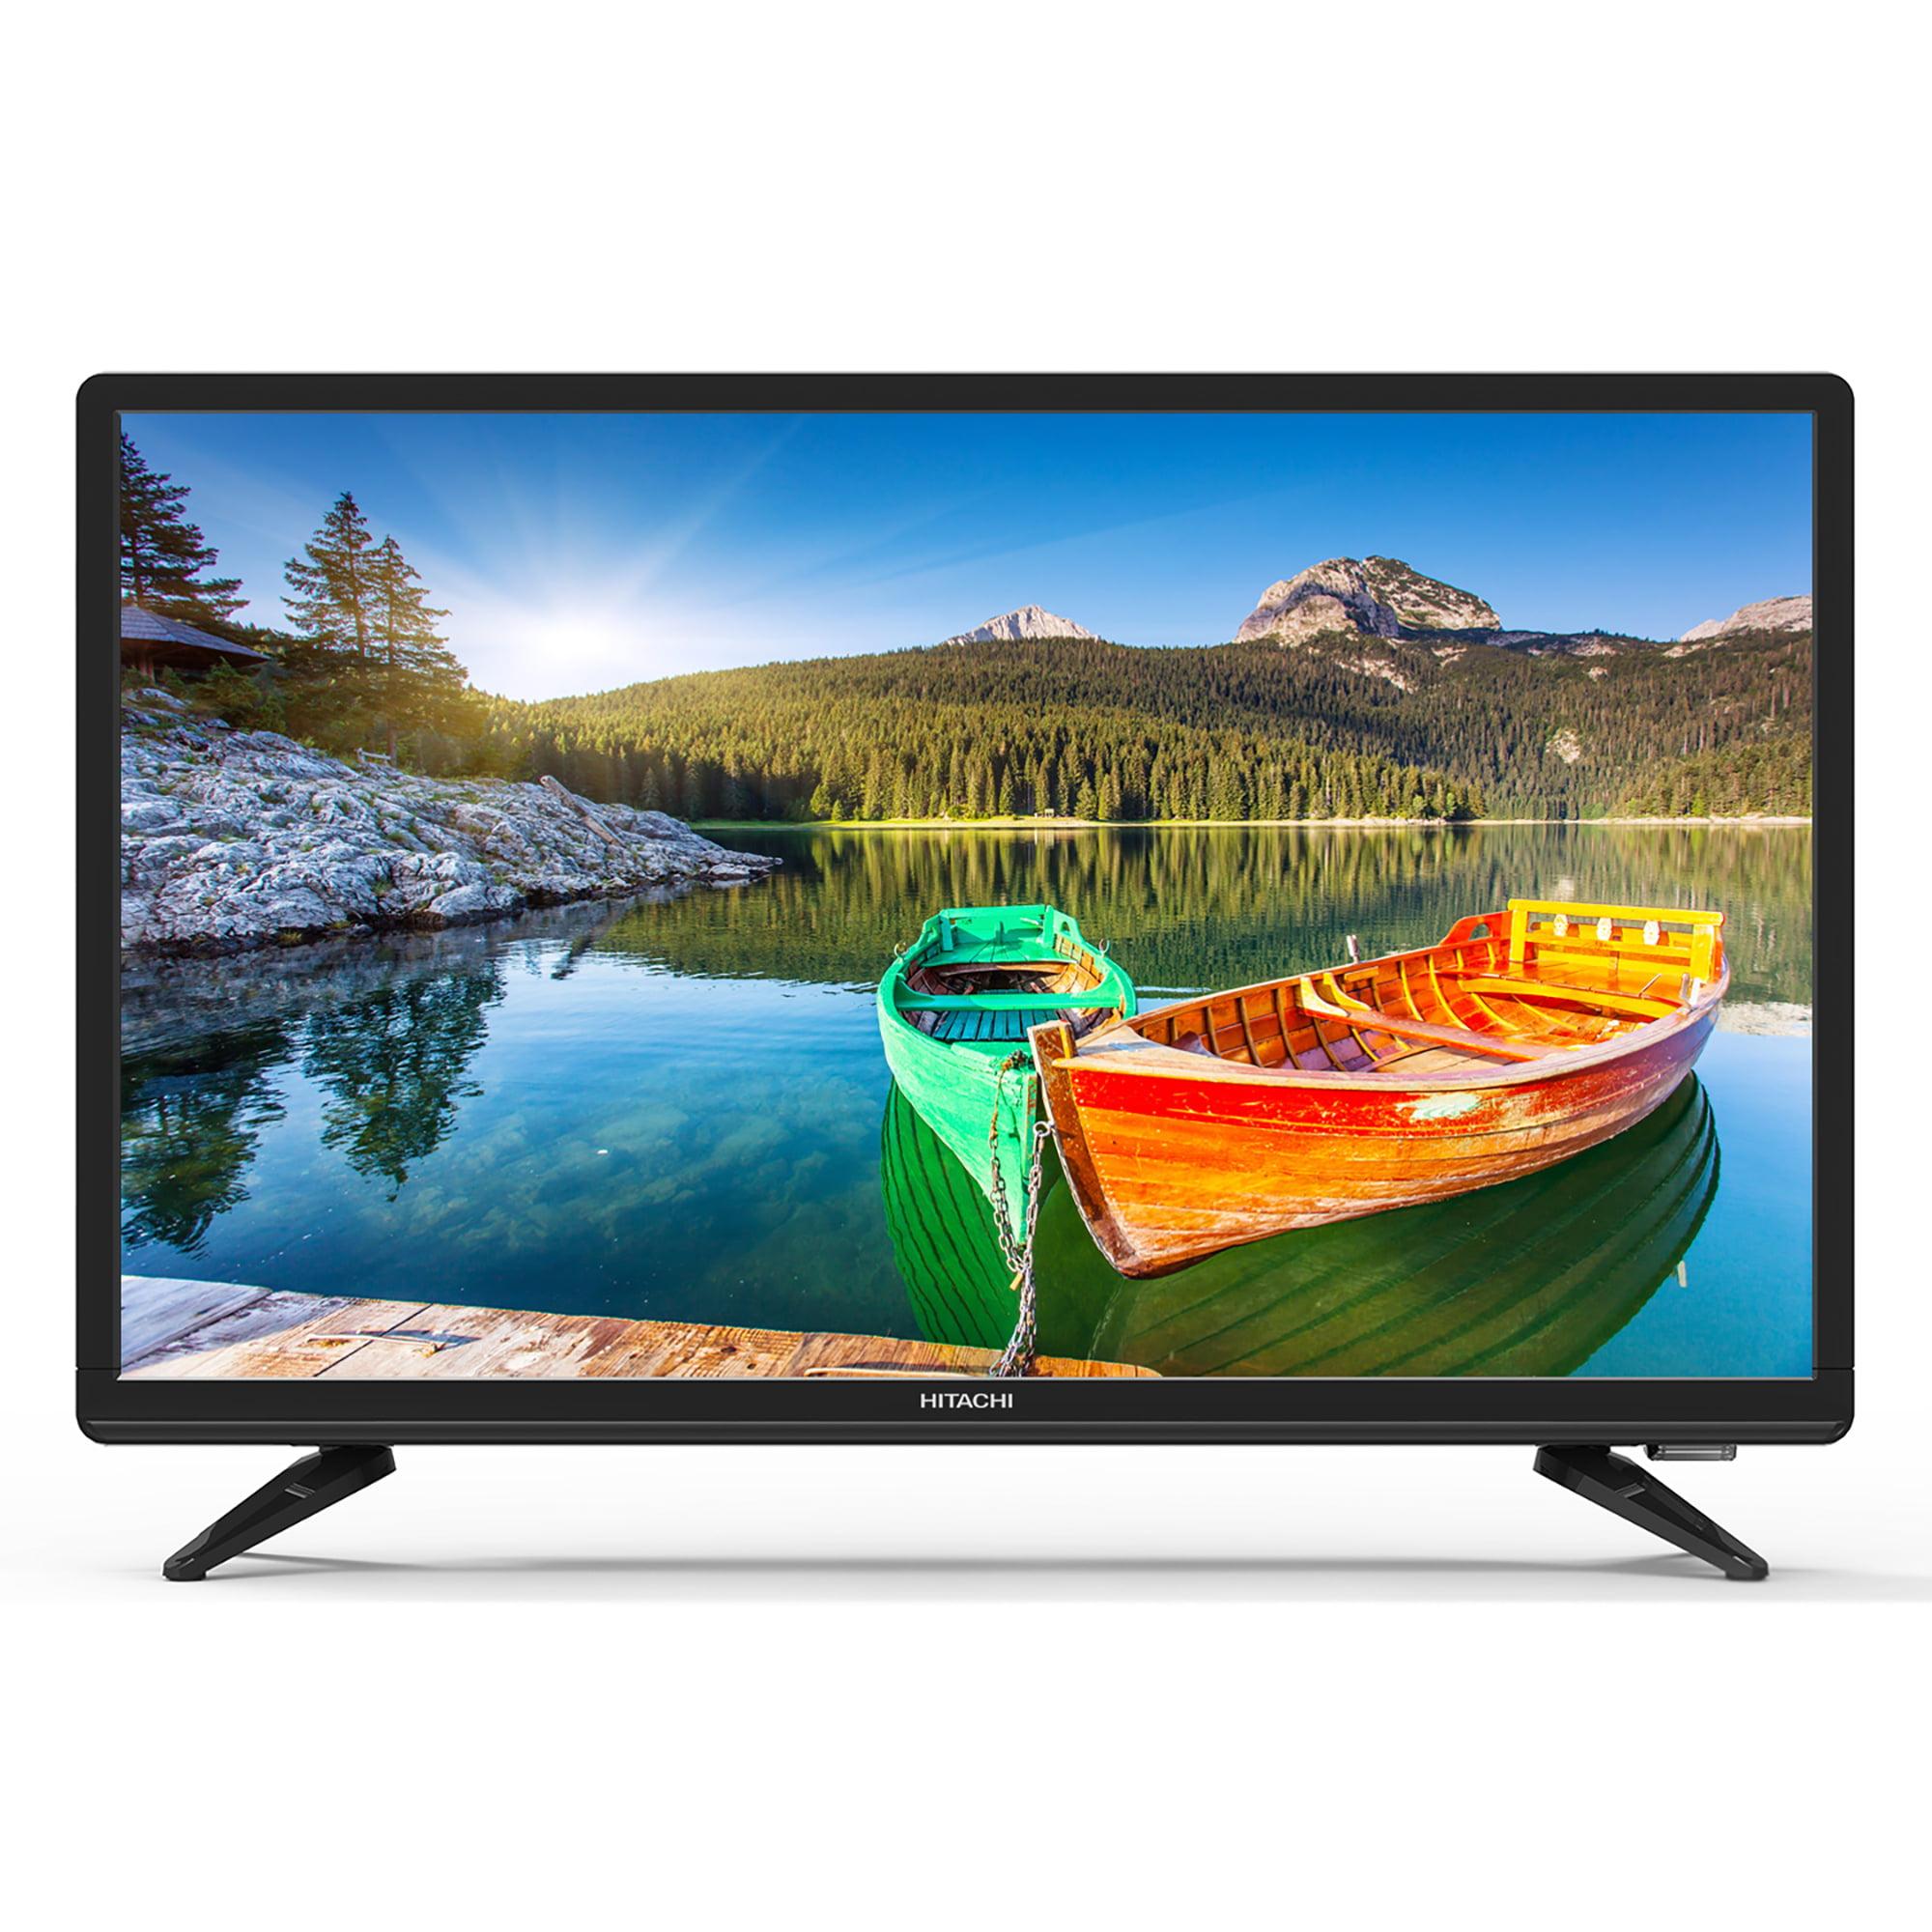 "Hitachi 22"" Class FHD (1080P) LED TV (22E30)"